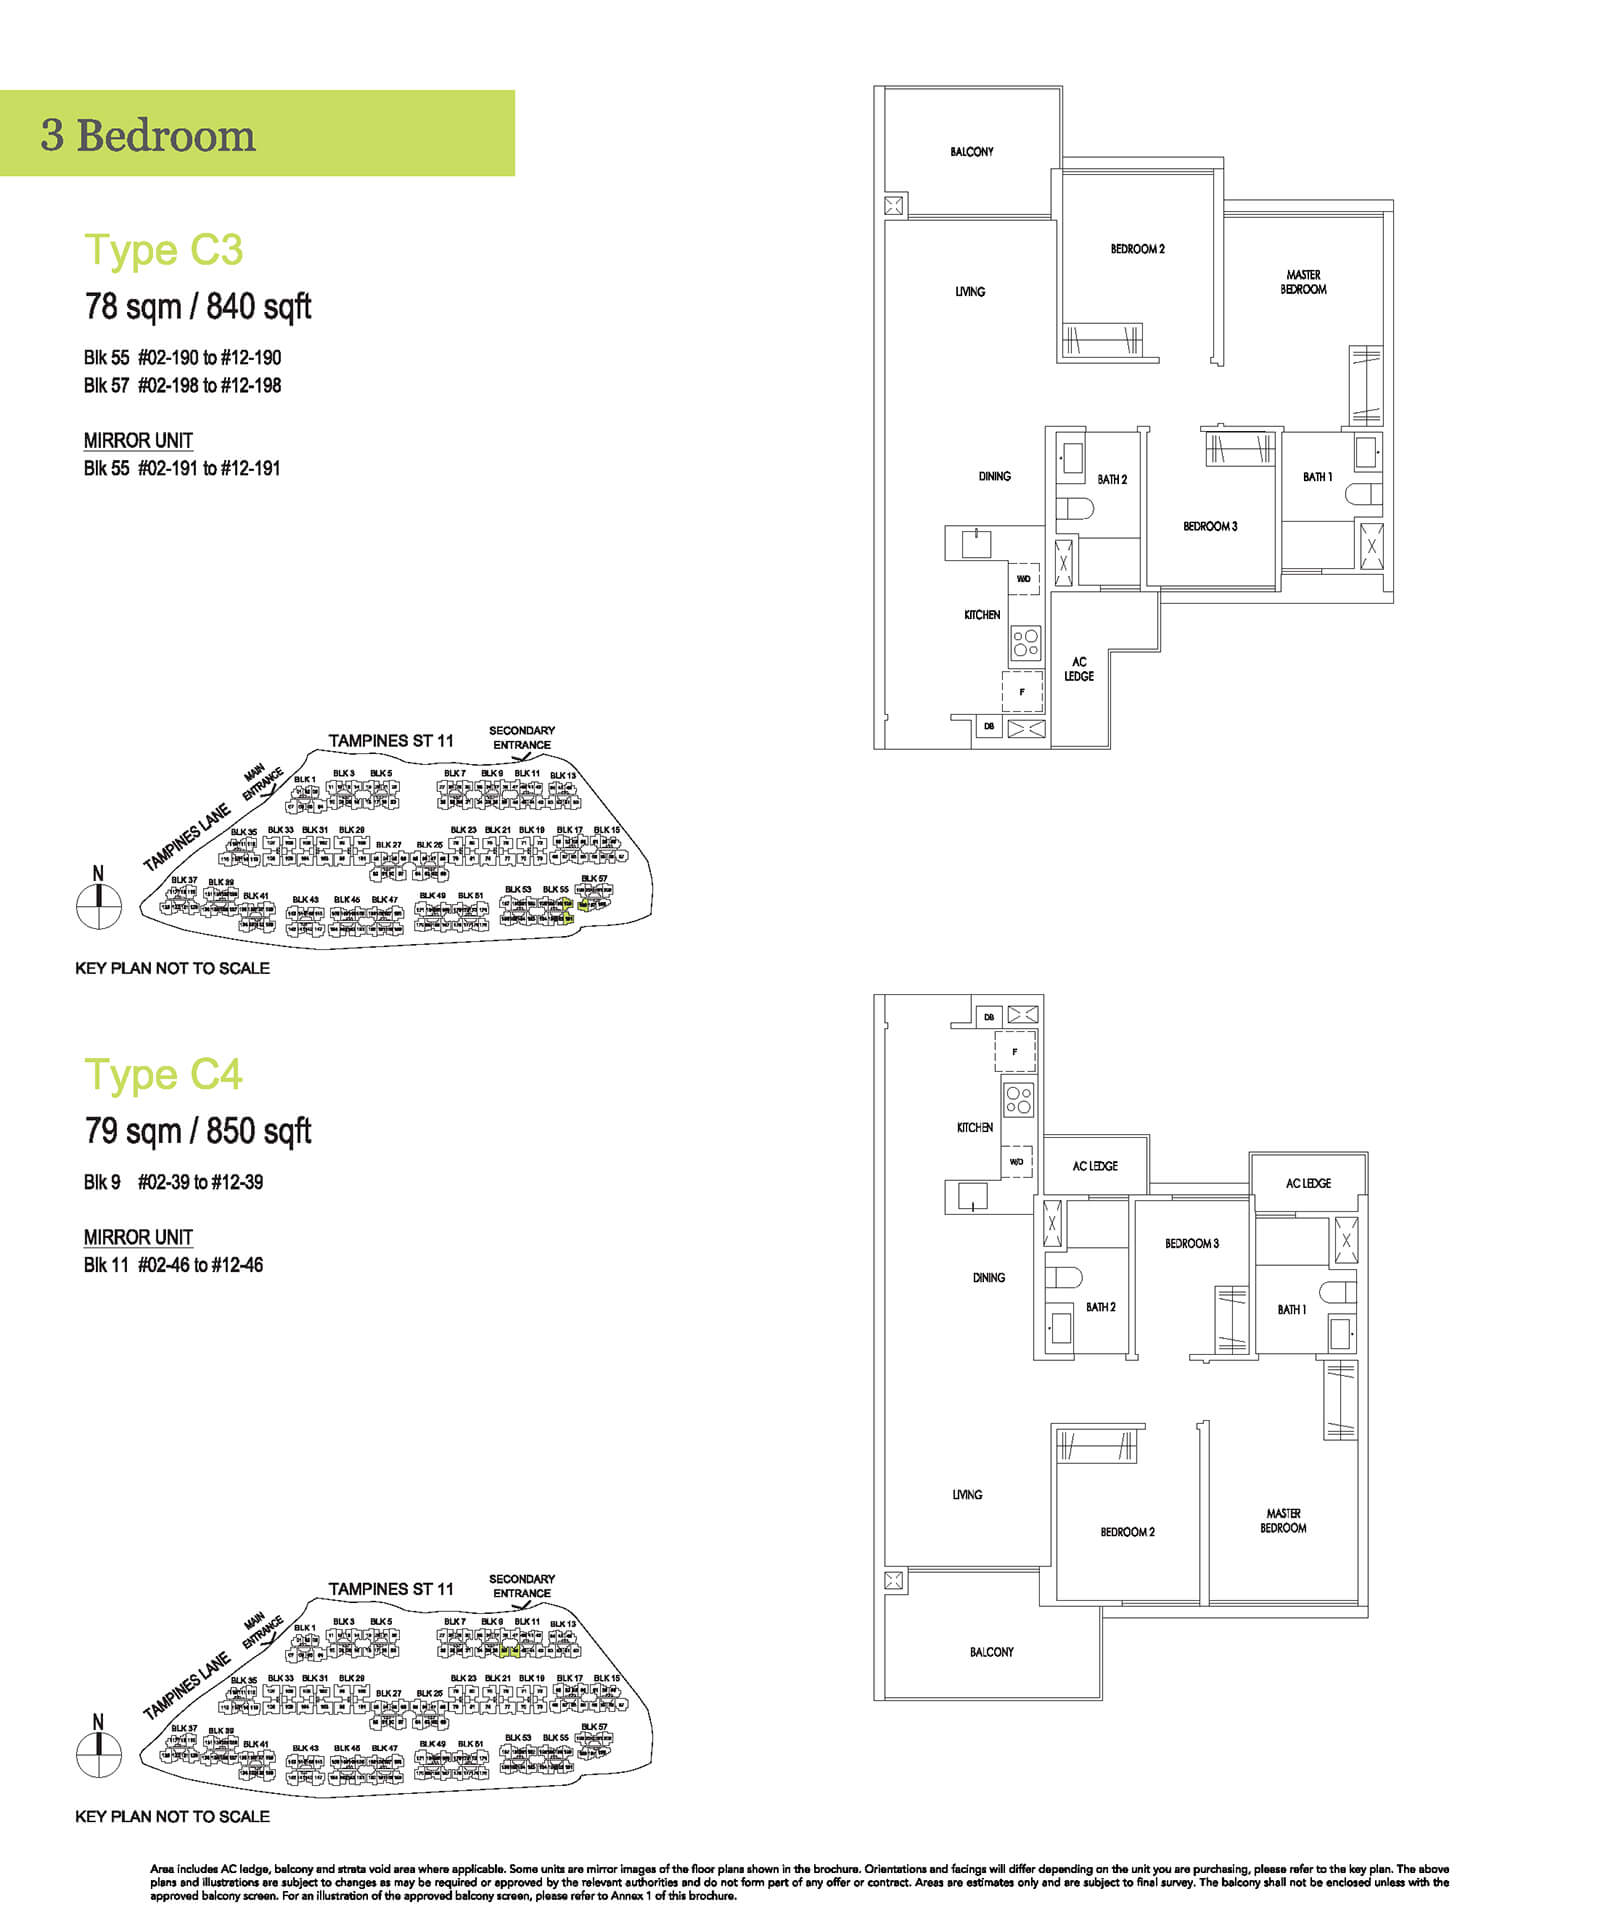 Treasure At Tampines Floor Plan 3-Bedroom C3 C4